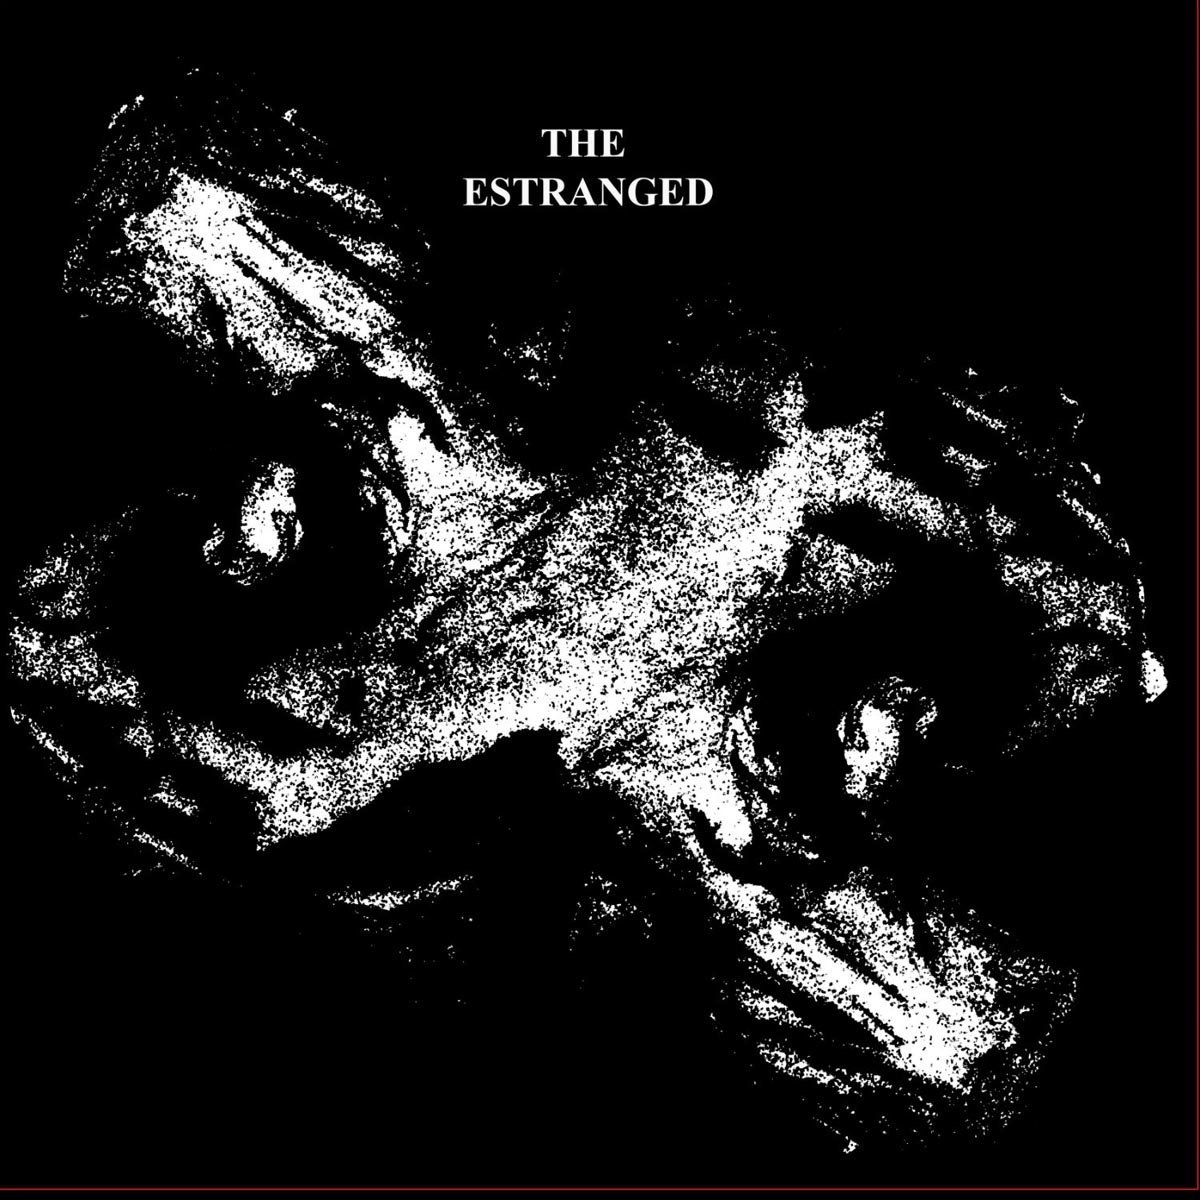 the estranged